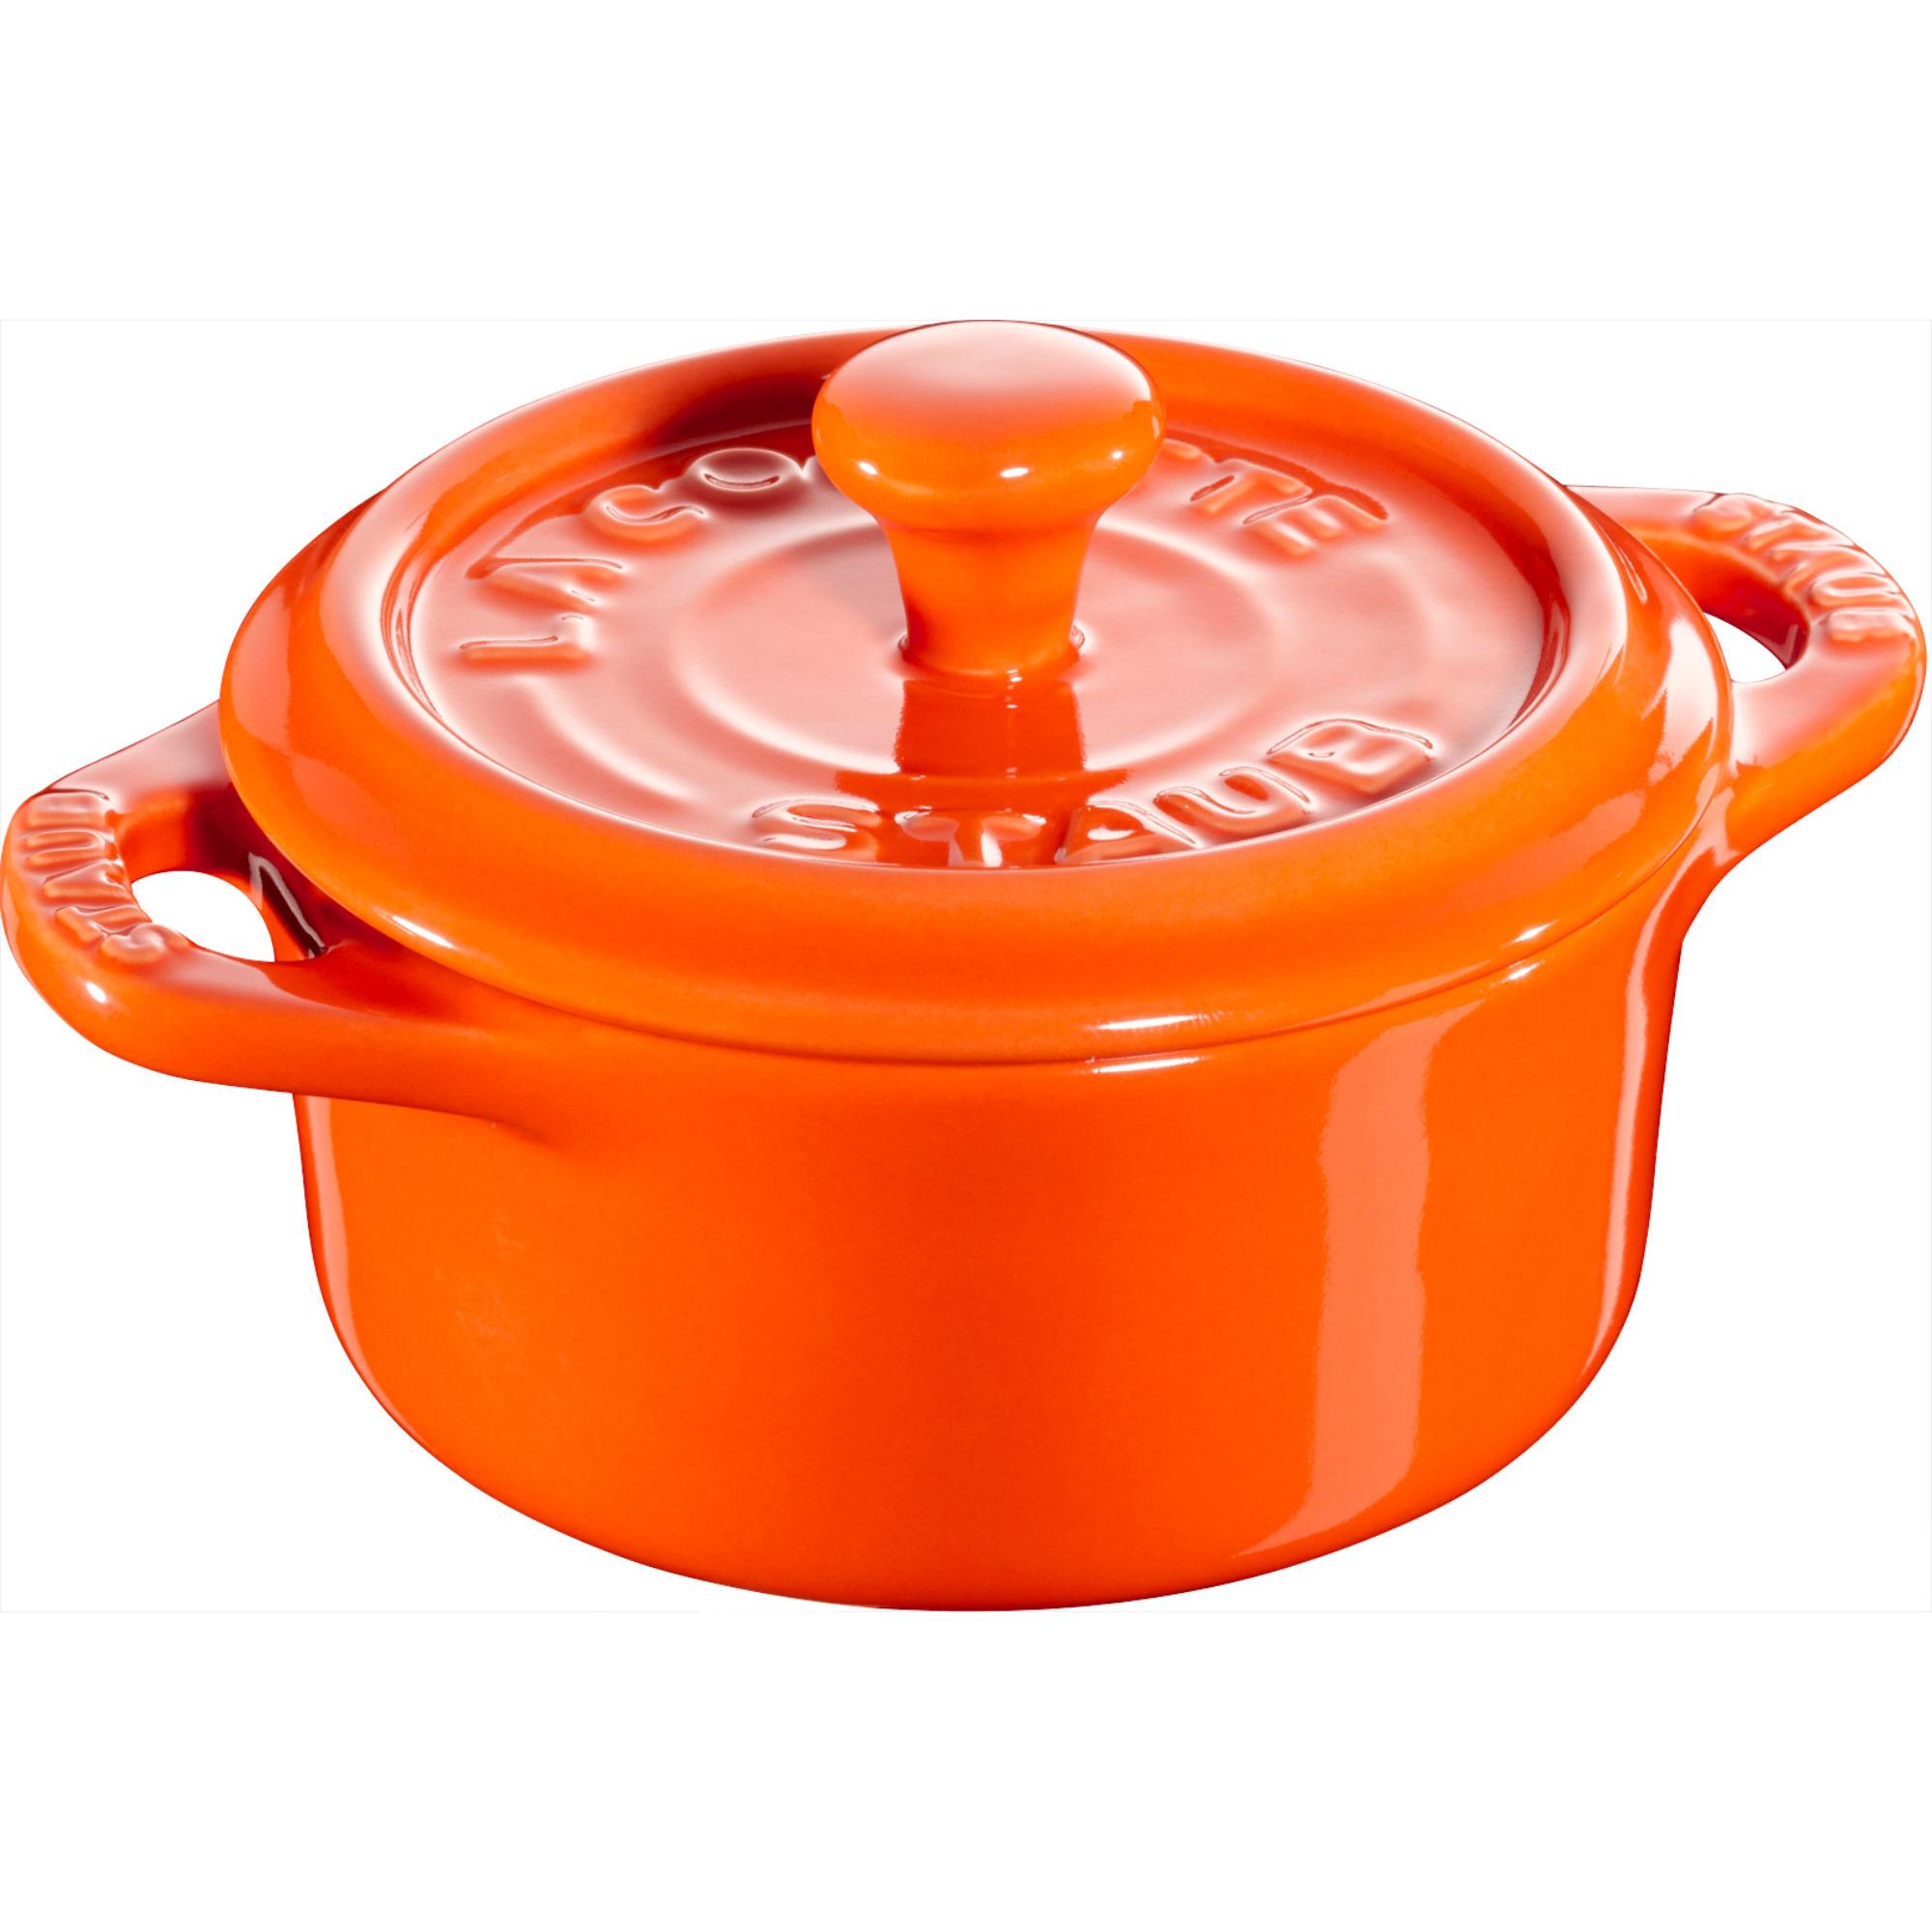 Staub Ceramic Rund Minigryta Orange 10 cm 02 l